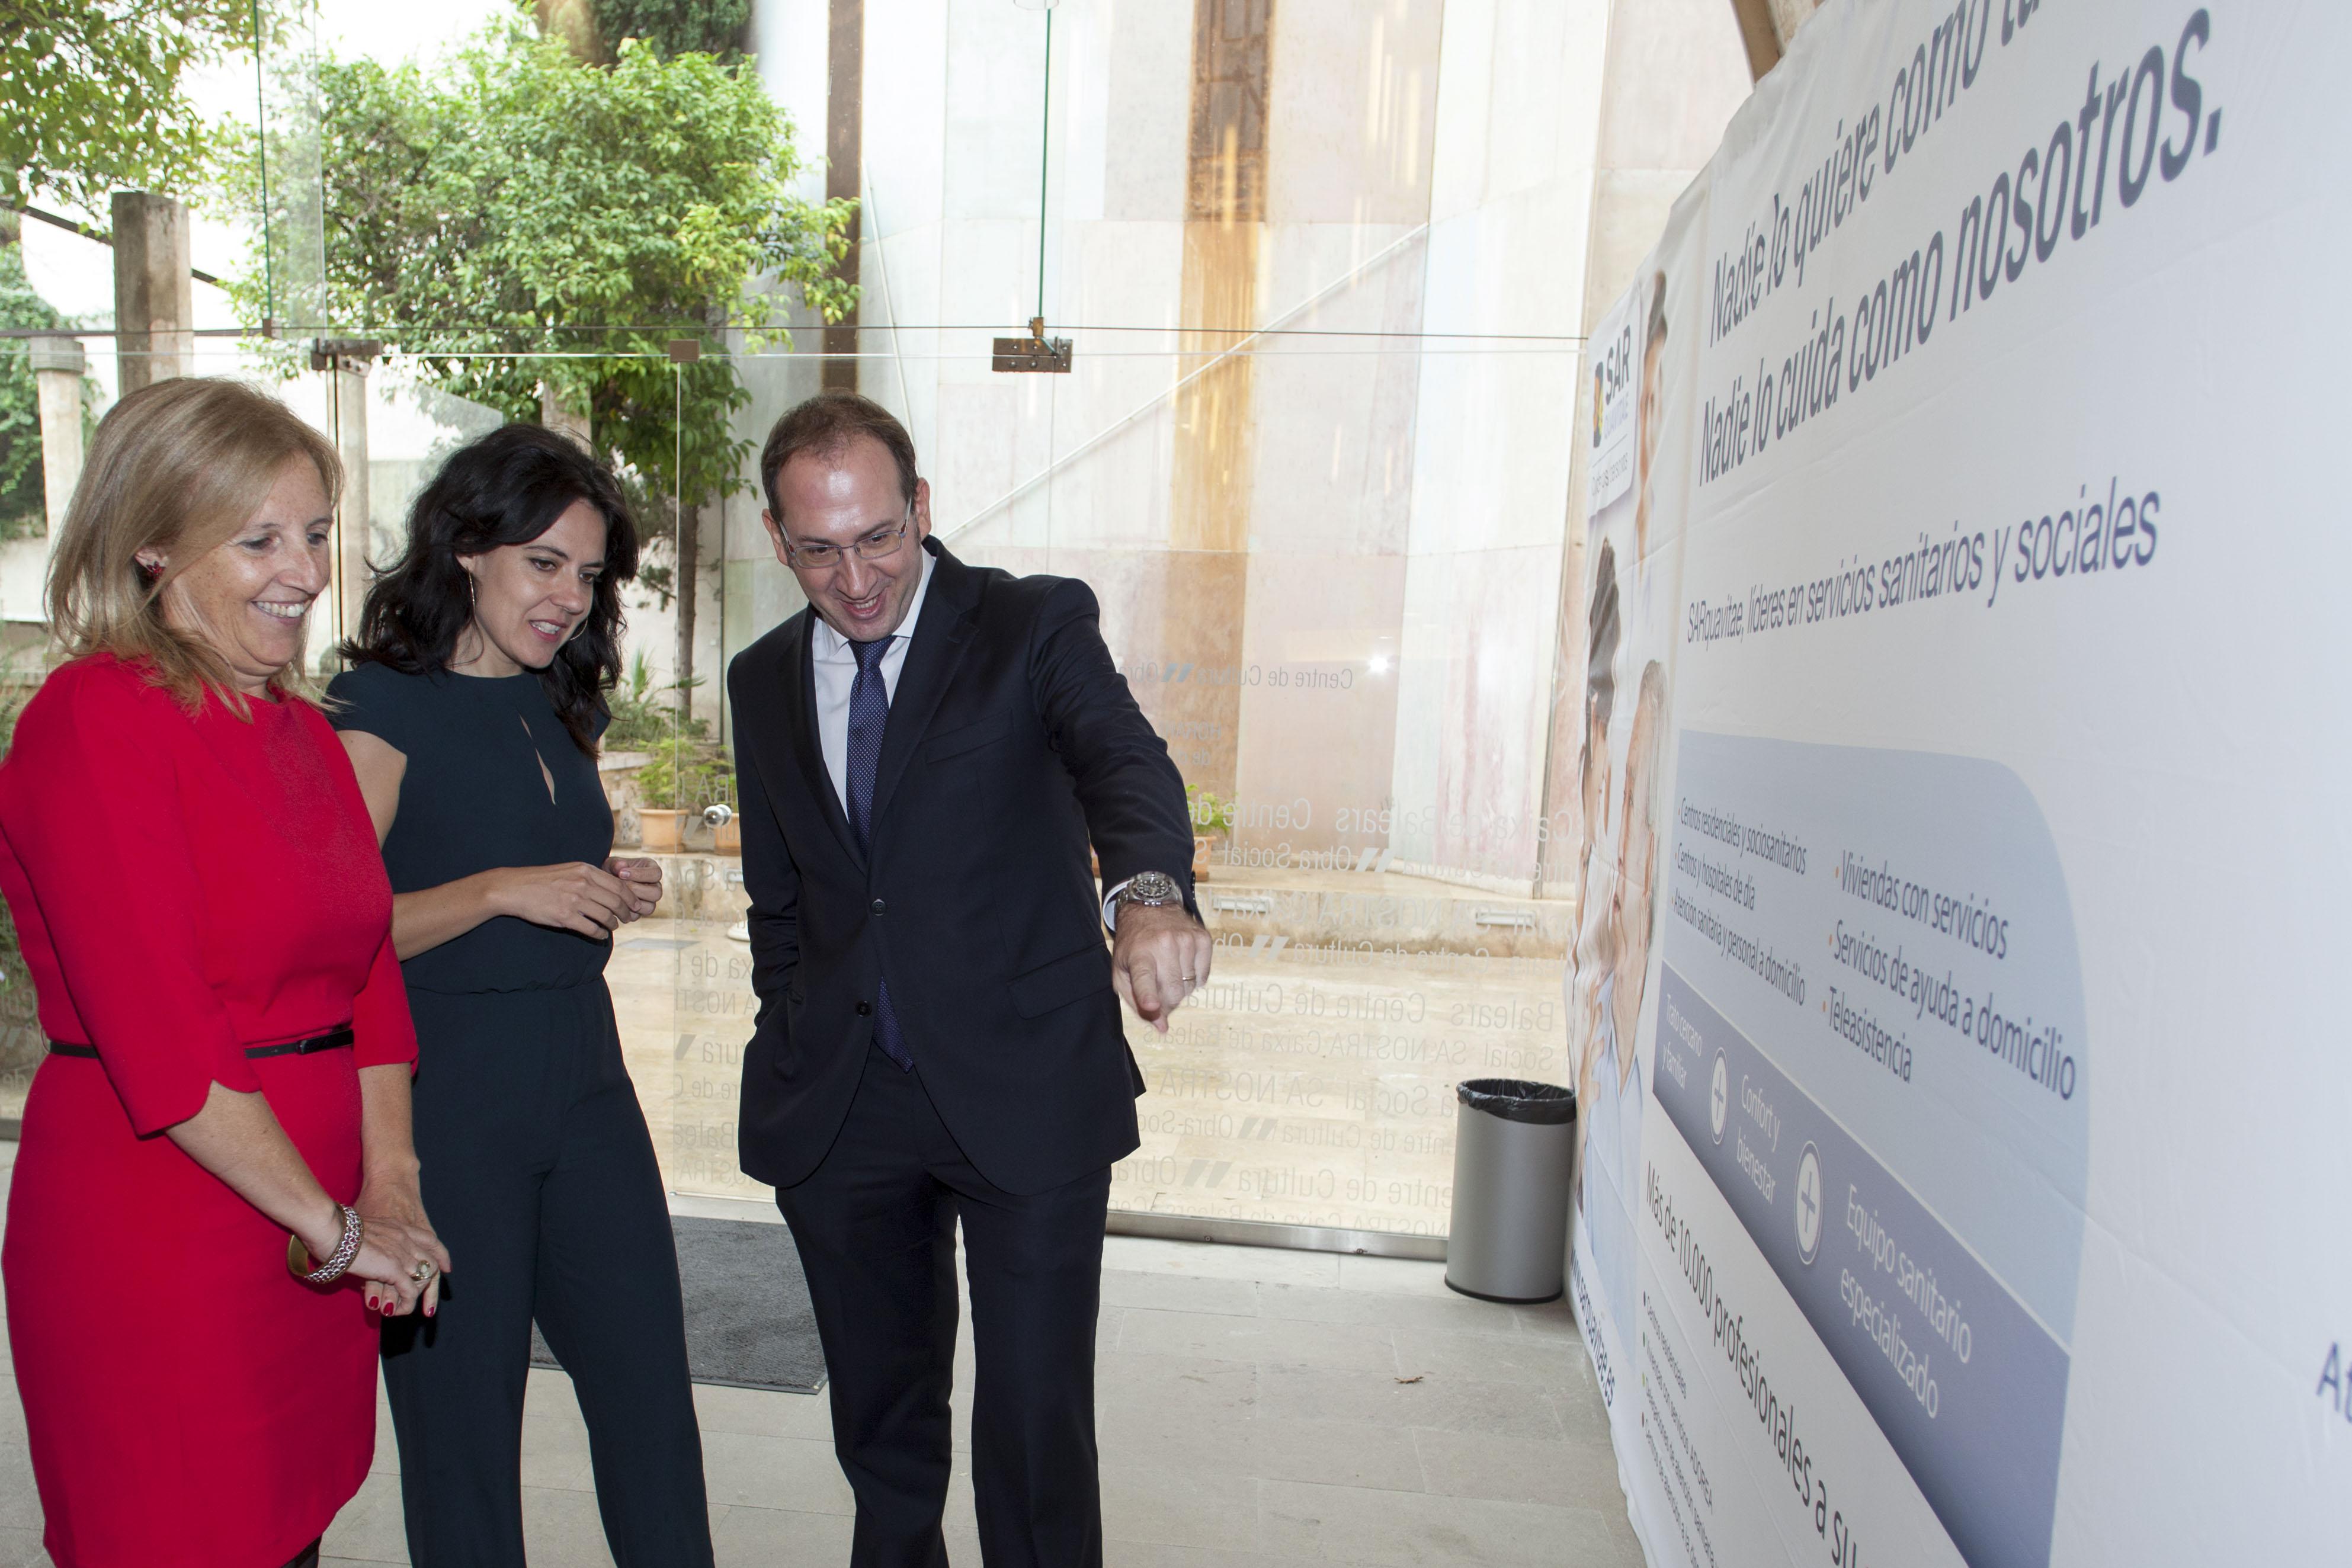 14-10-2014 Jornada SarQuavitae Palma de Mallorca 19